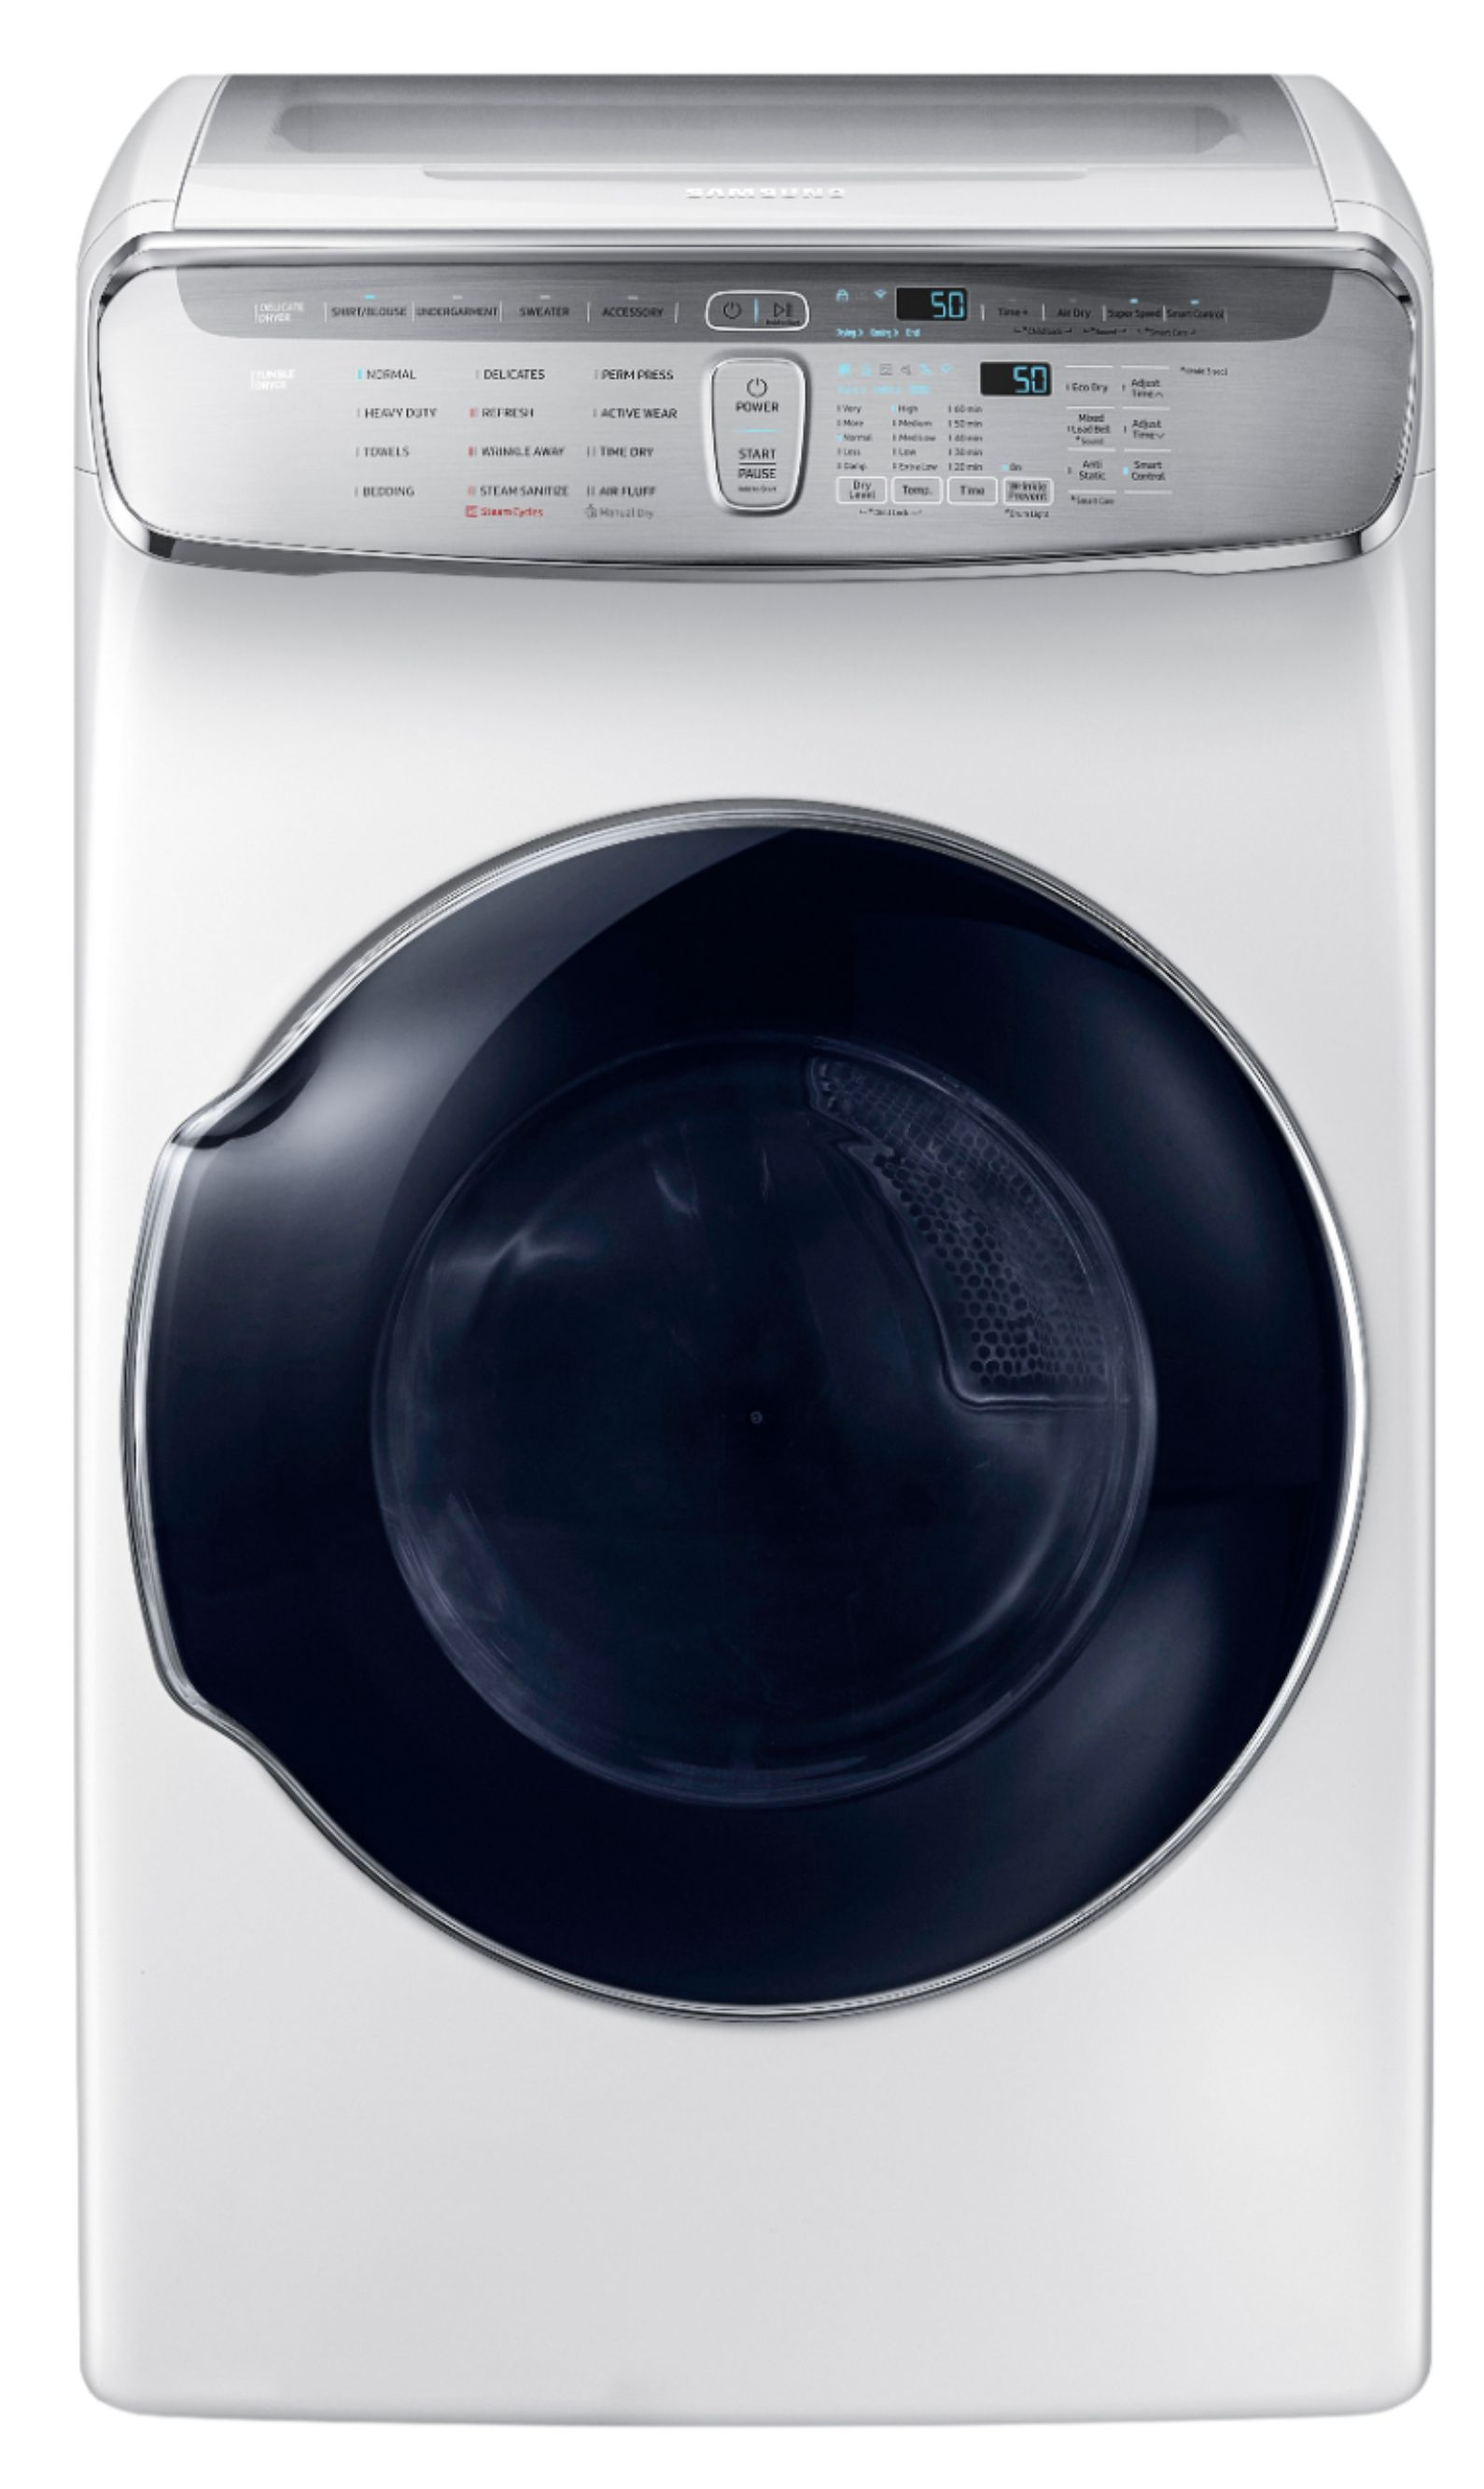 hight resolution of capacity flexdry electric dryer white dve60m9900w best buy